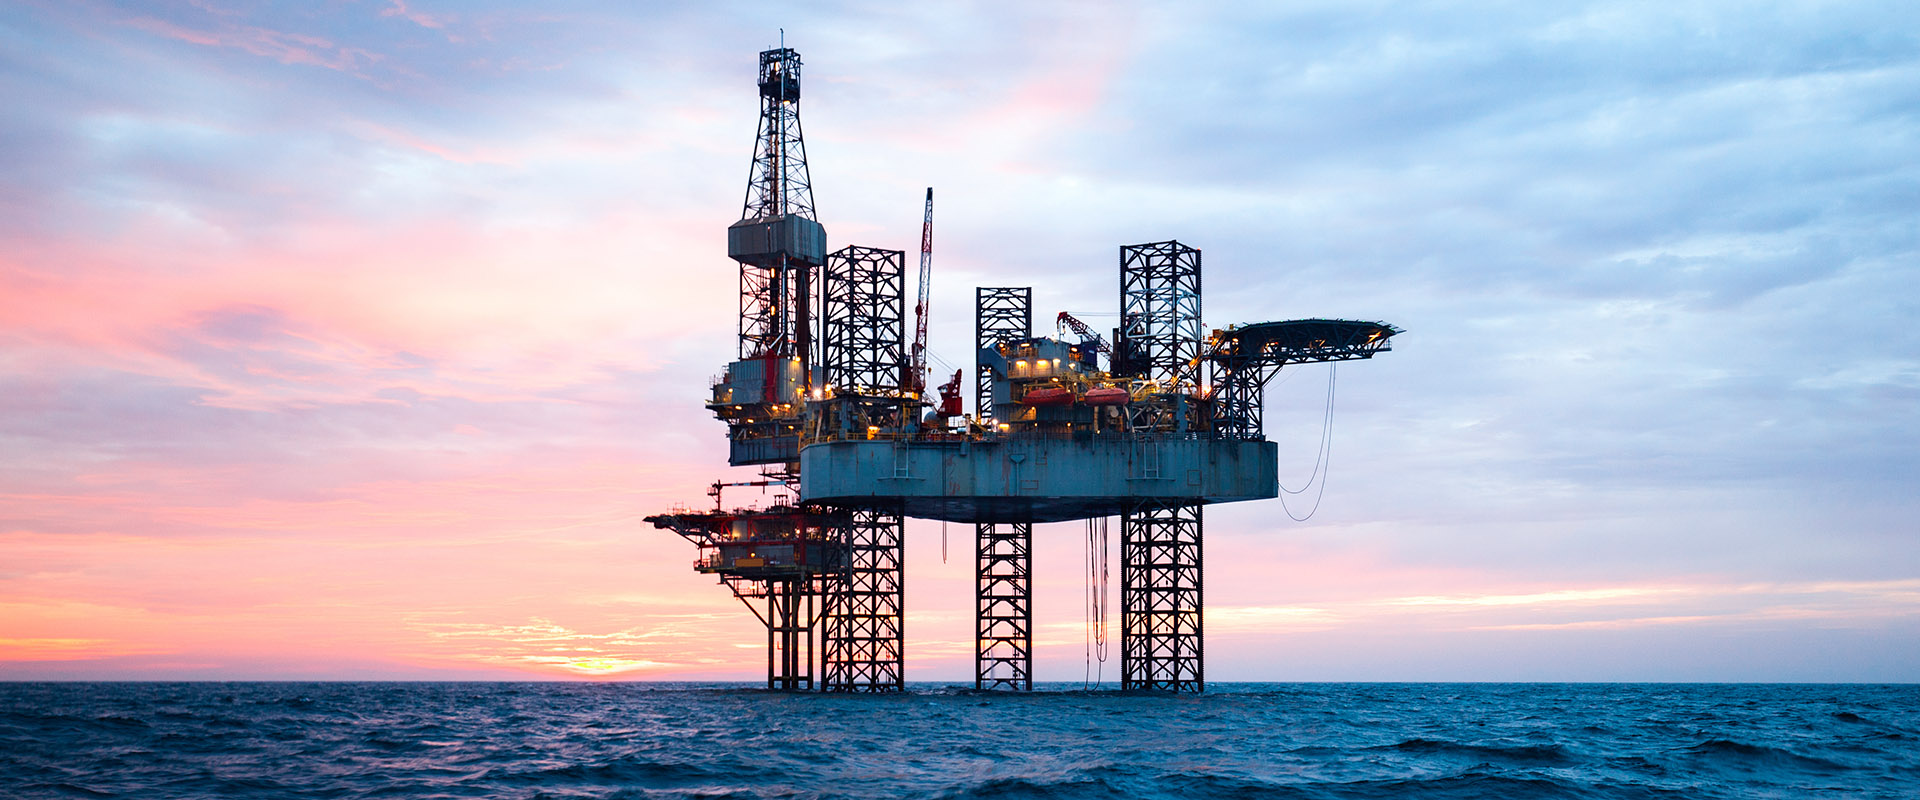 Drilling rig | Orga